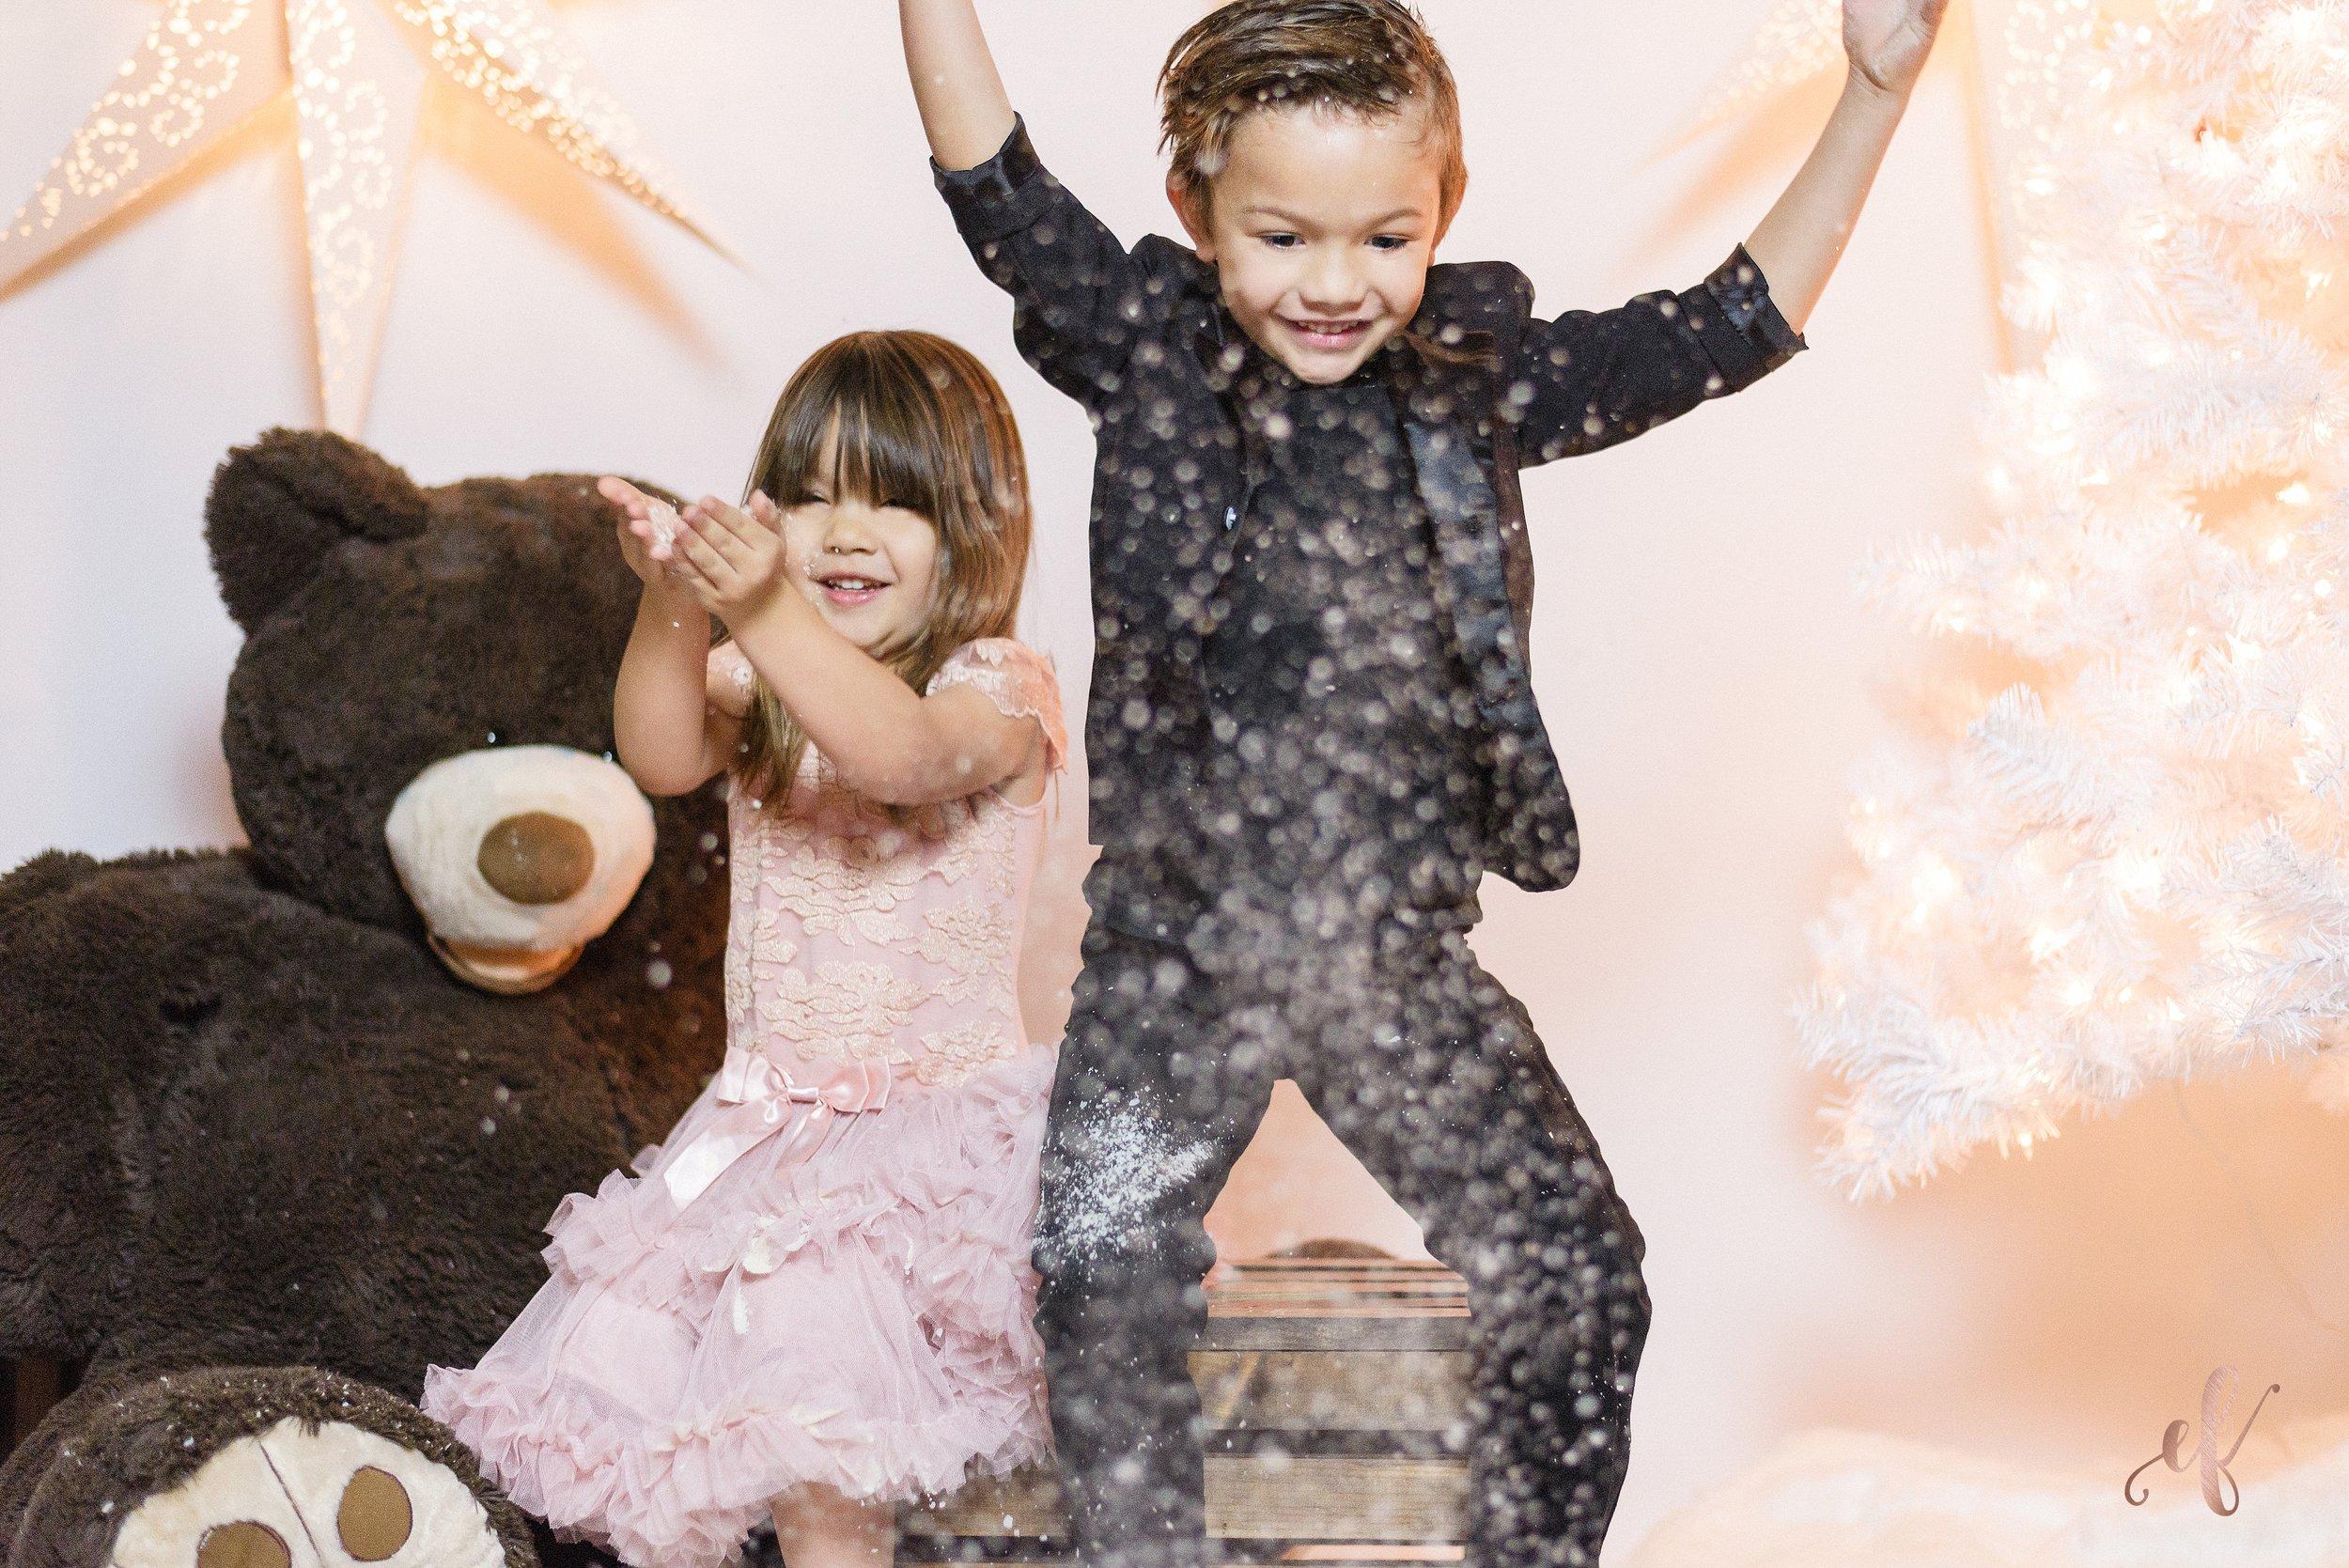 San Diego Portrait Photographer | Studio | Christmas | Snow | Ernie & Fiona Photography